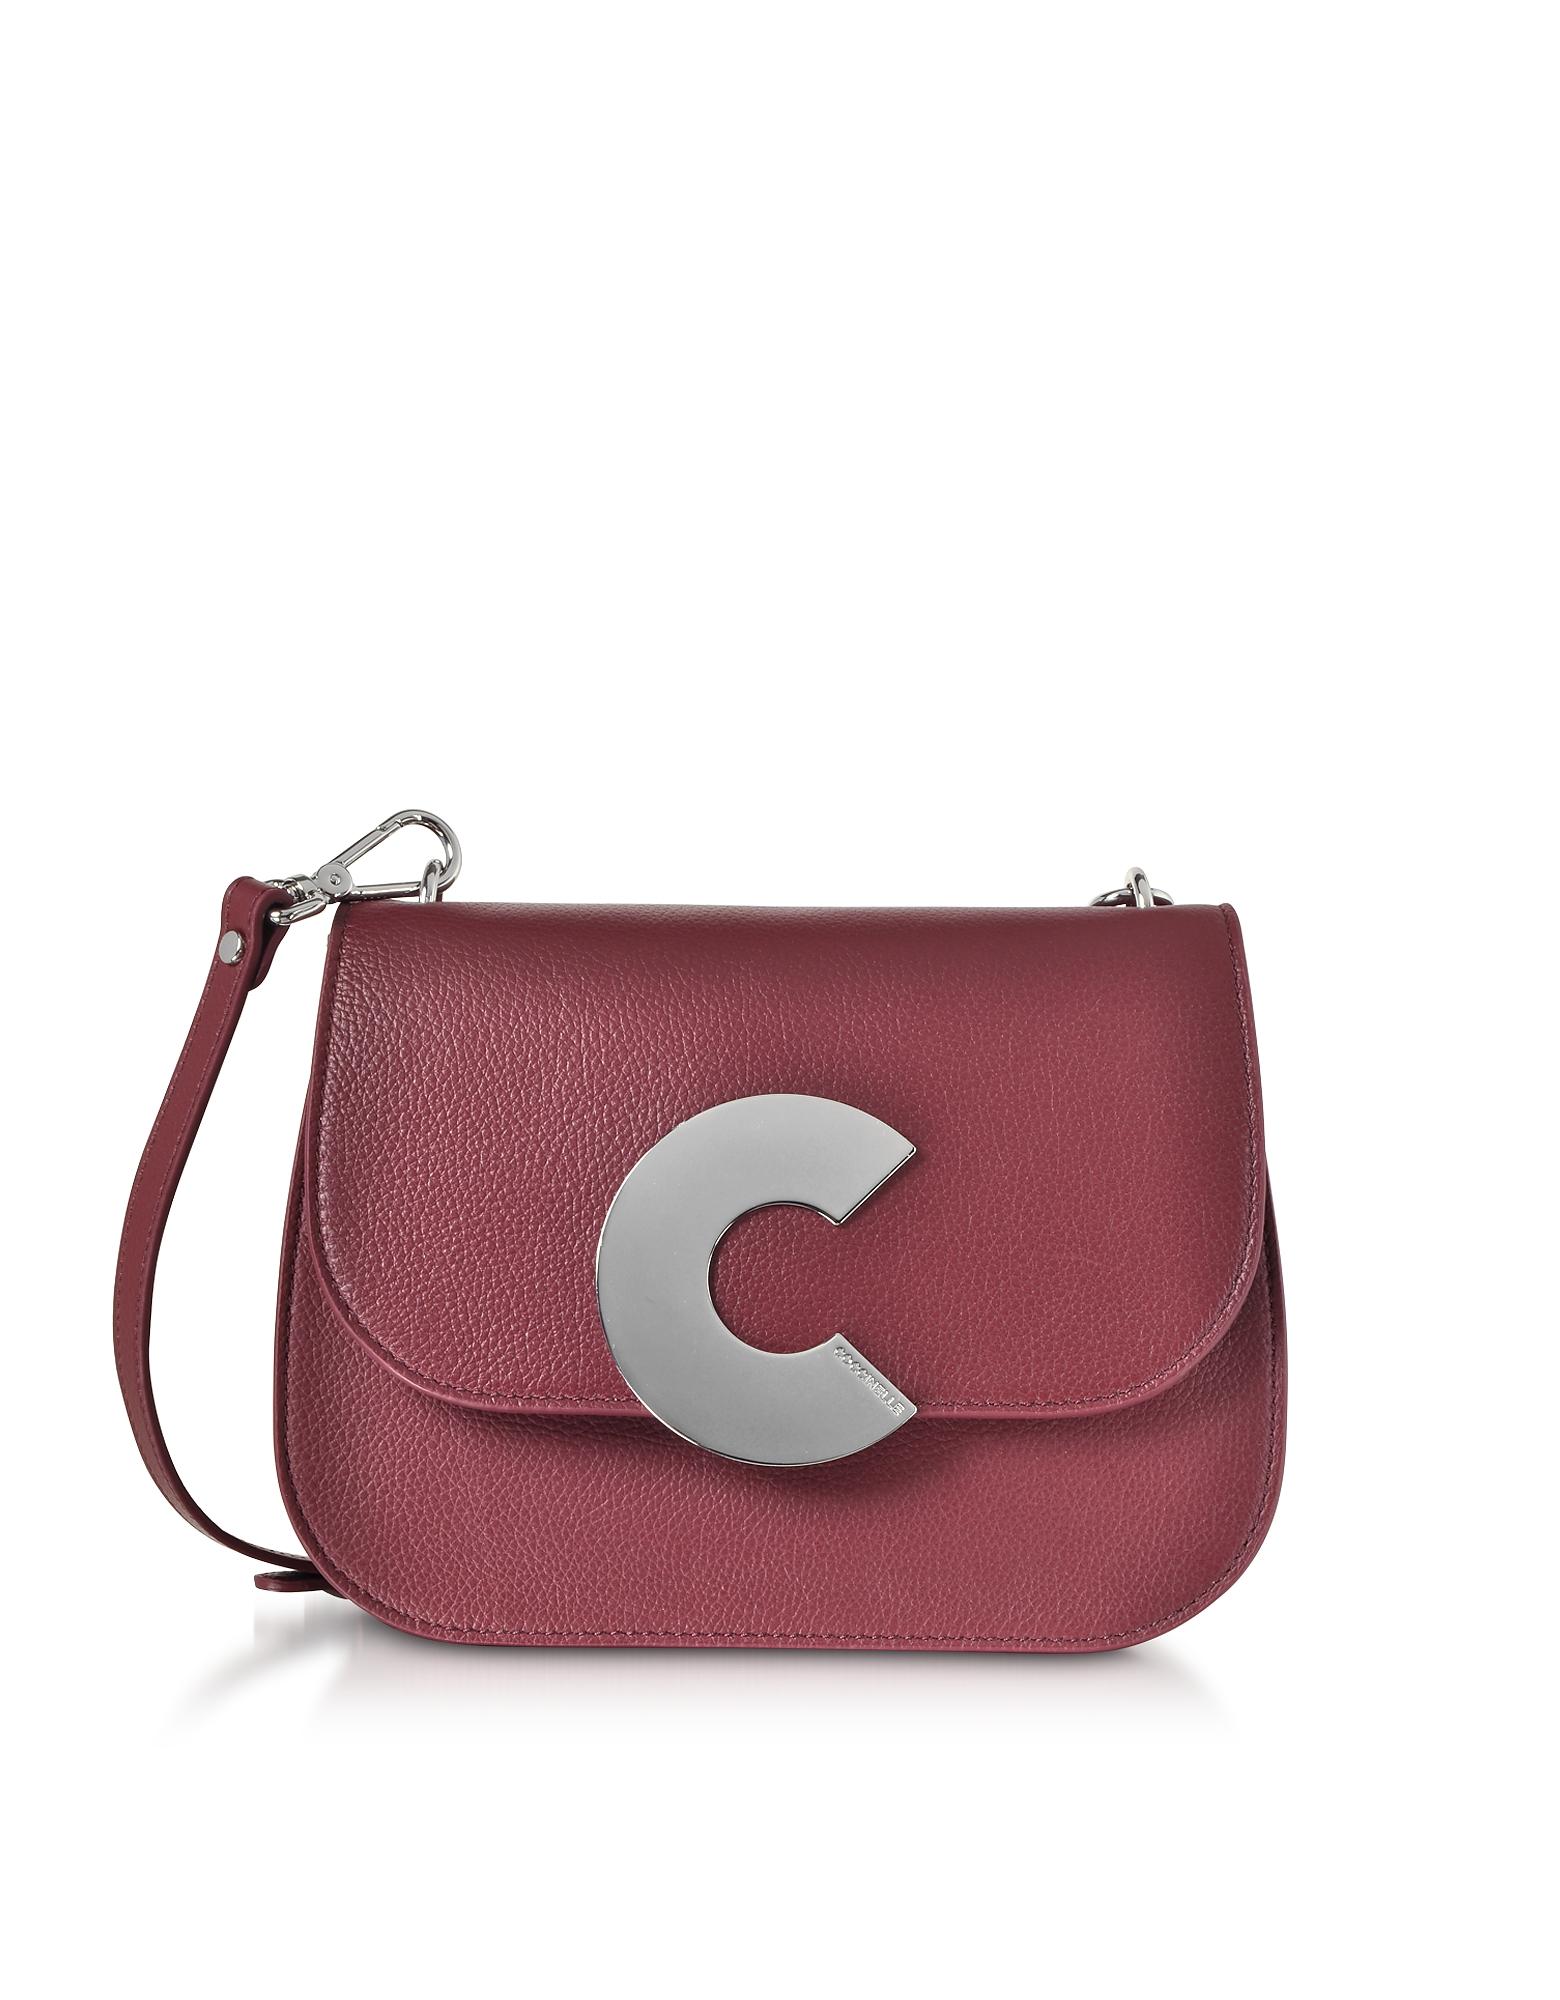 Coccinelle Handbags, Craquante Grained Leather Medium Crossbody Bag